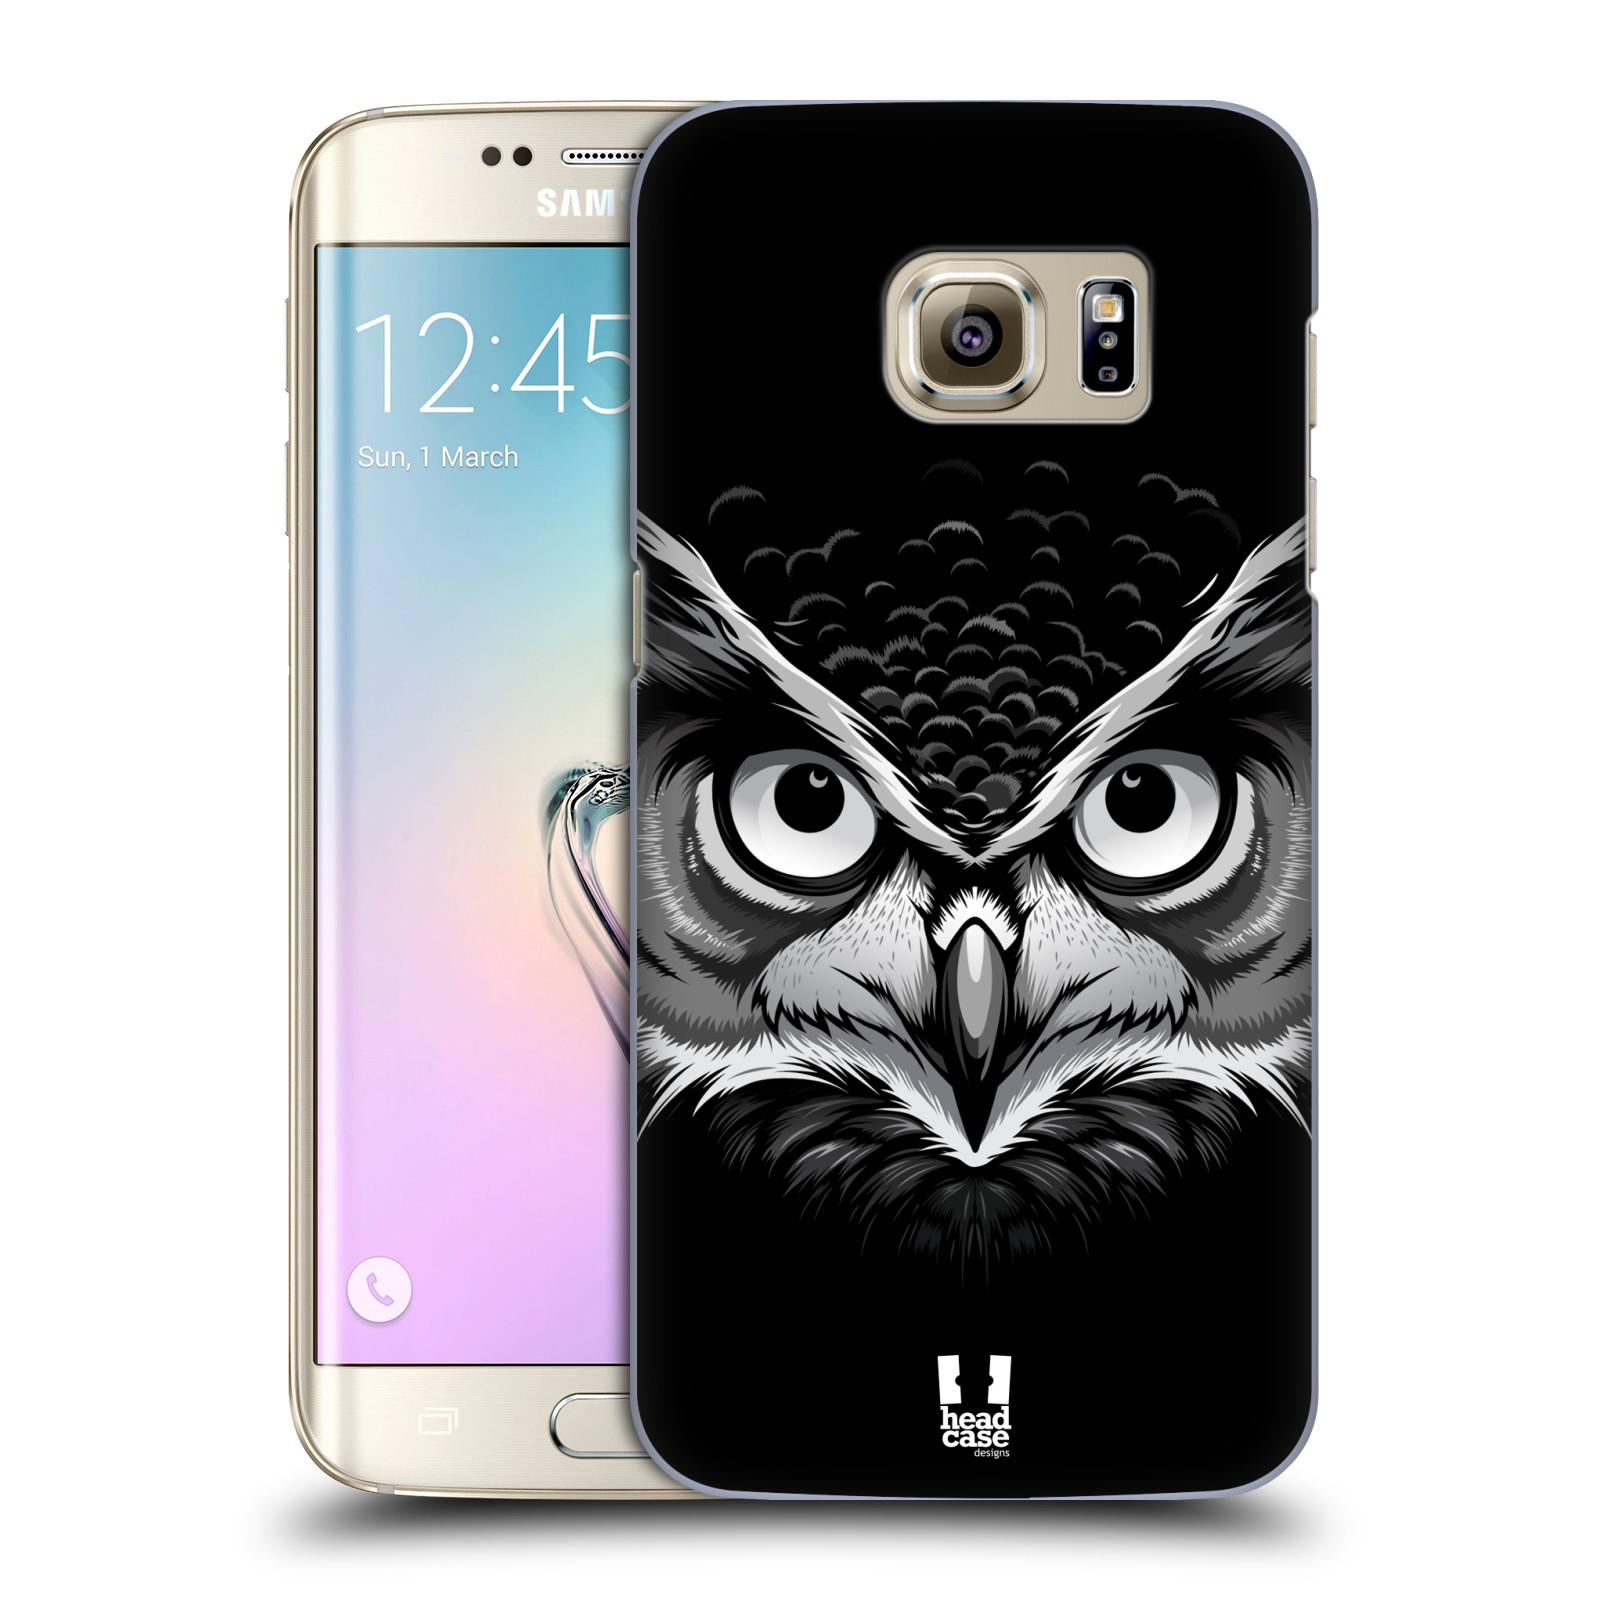 HEAD CASE plastový obal na mobil SAMSUNG GALAXY S7 EDGE vzor Zvíře kreslená tvář 2 sova